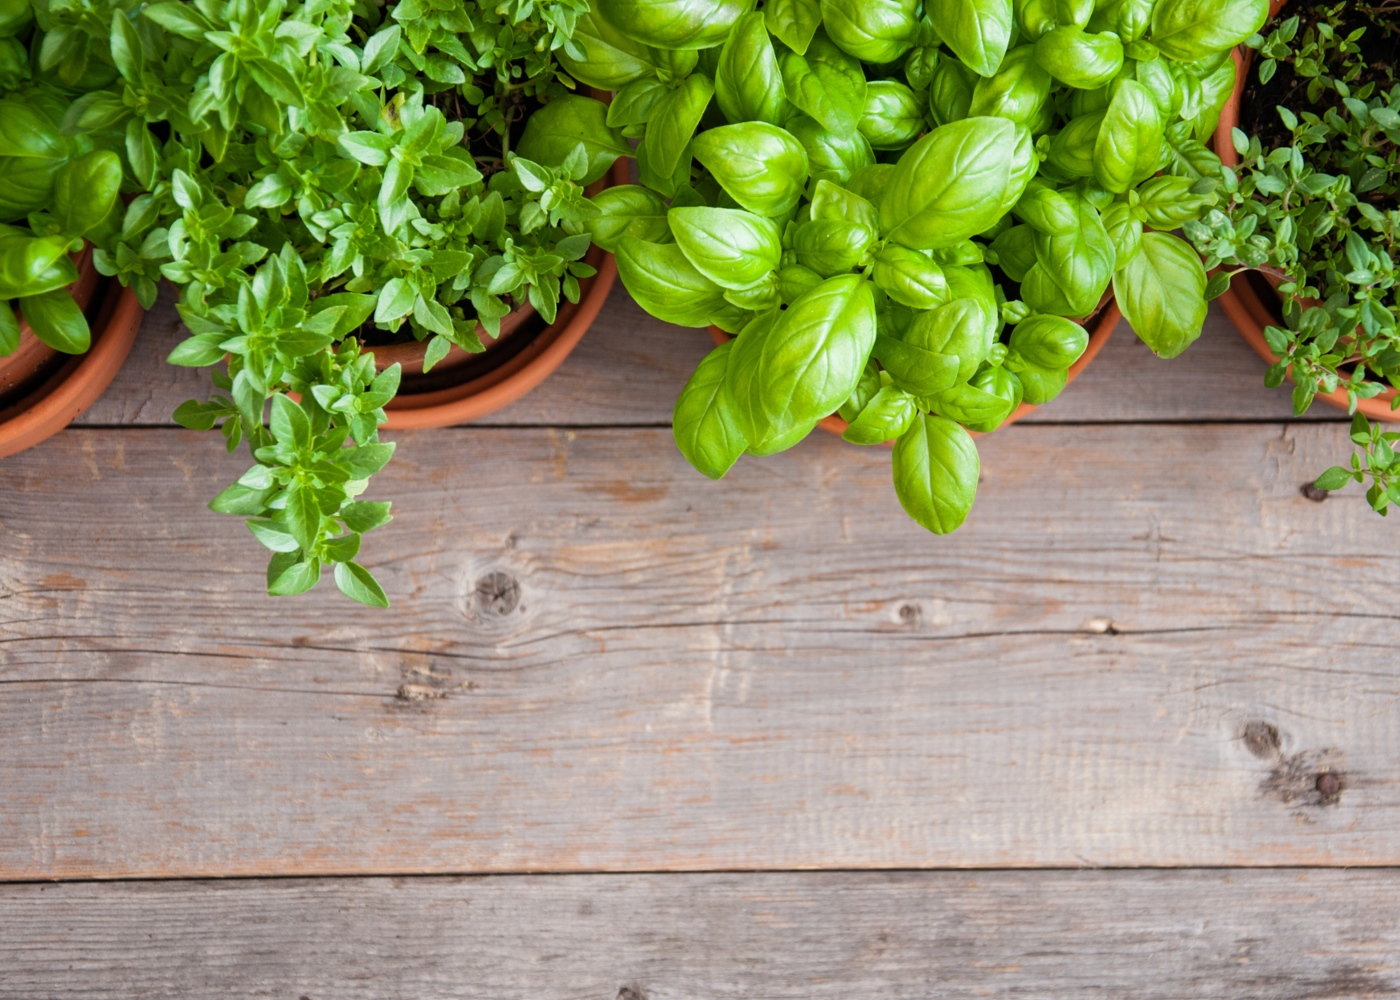 Alimentos que pode replantar: ervas aromáticas